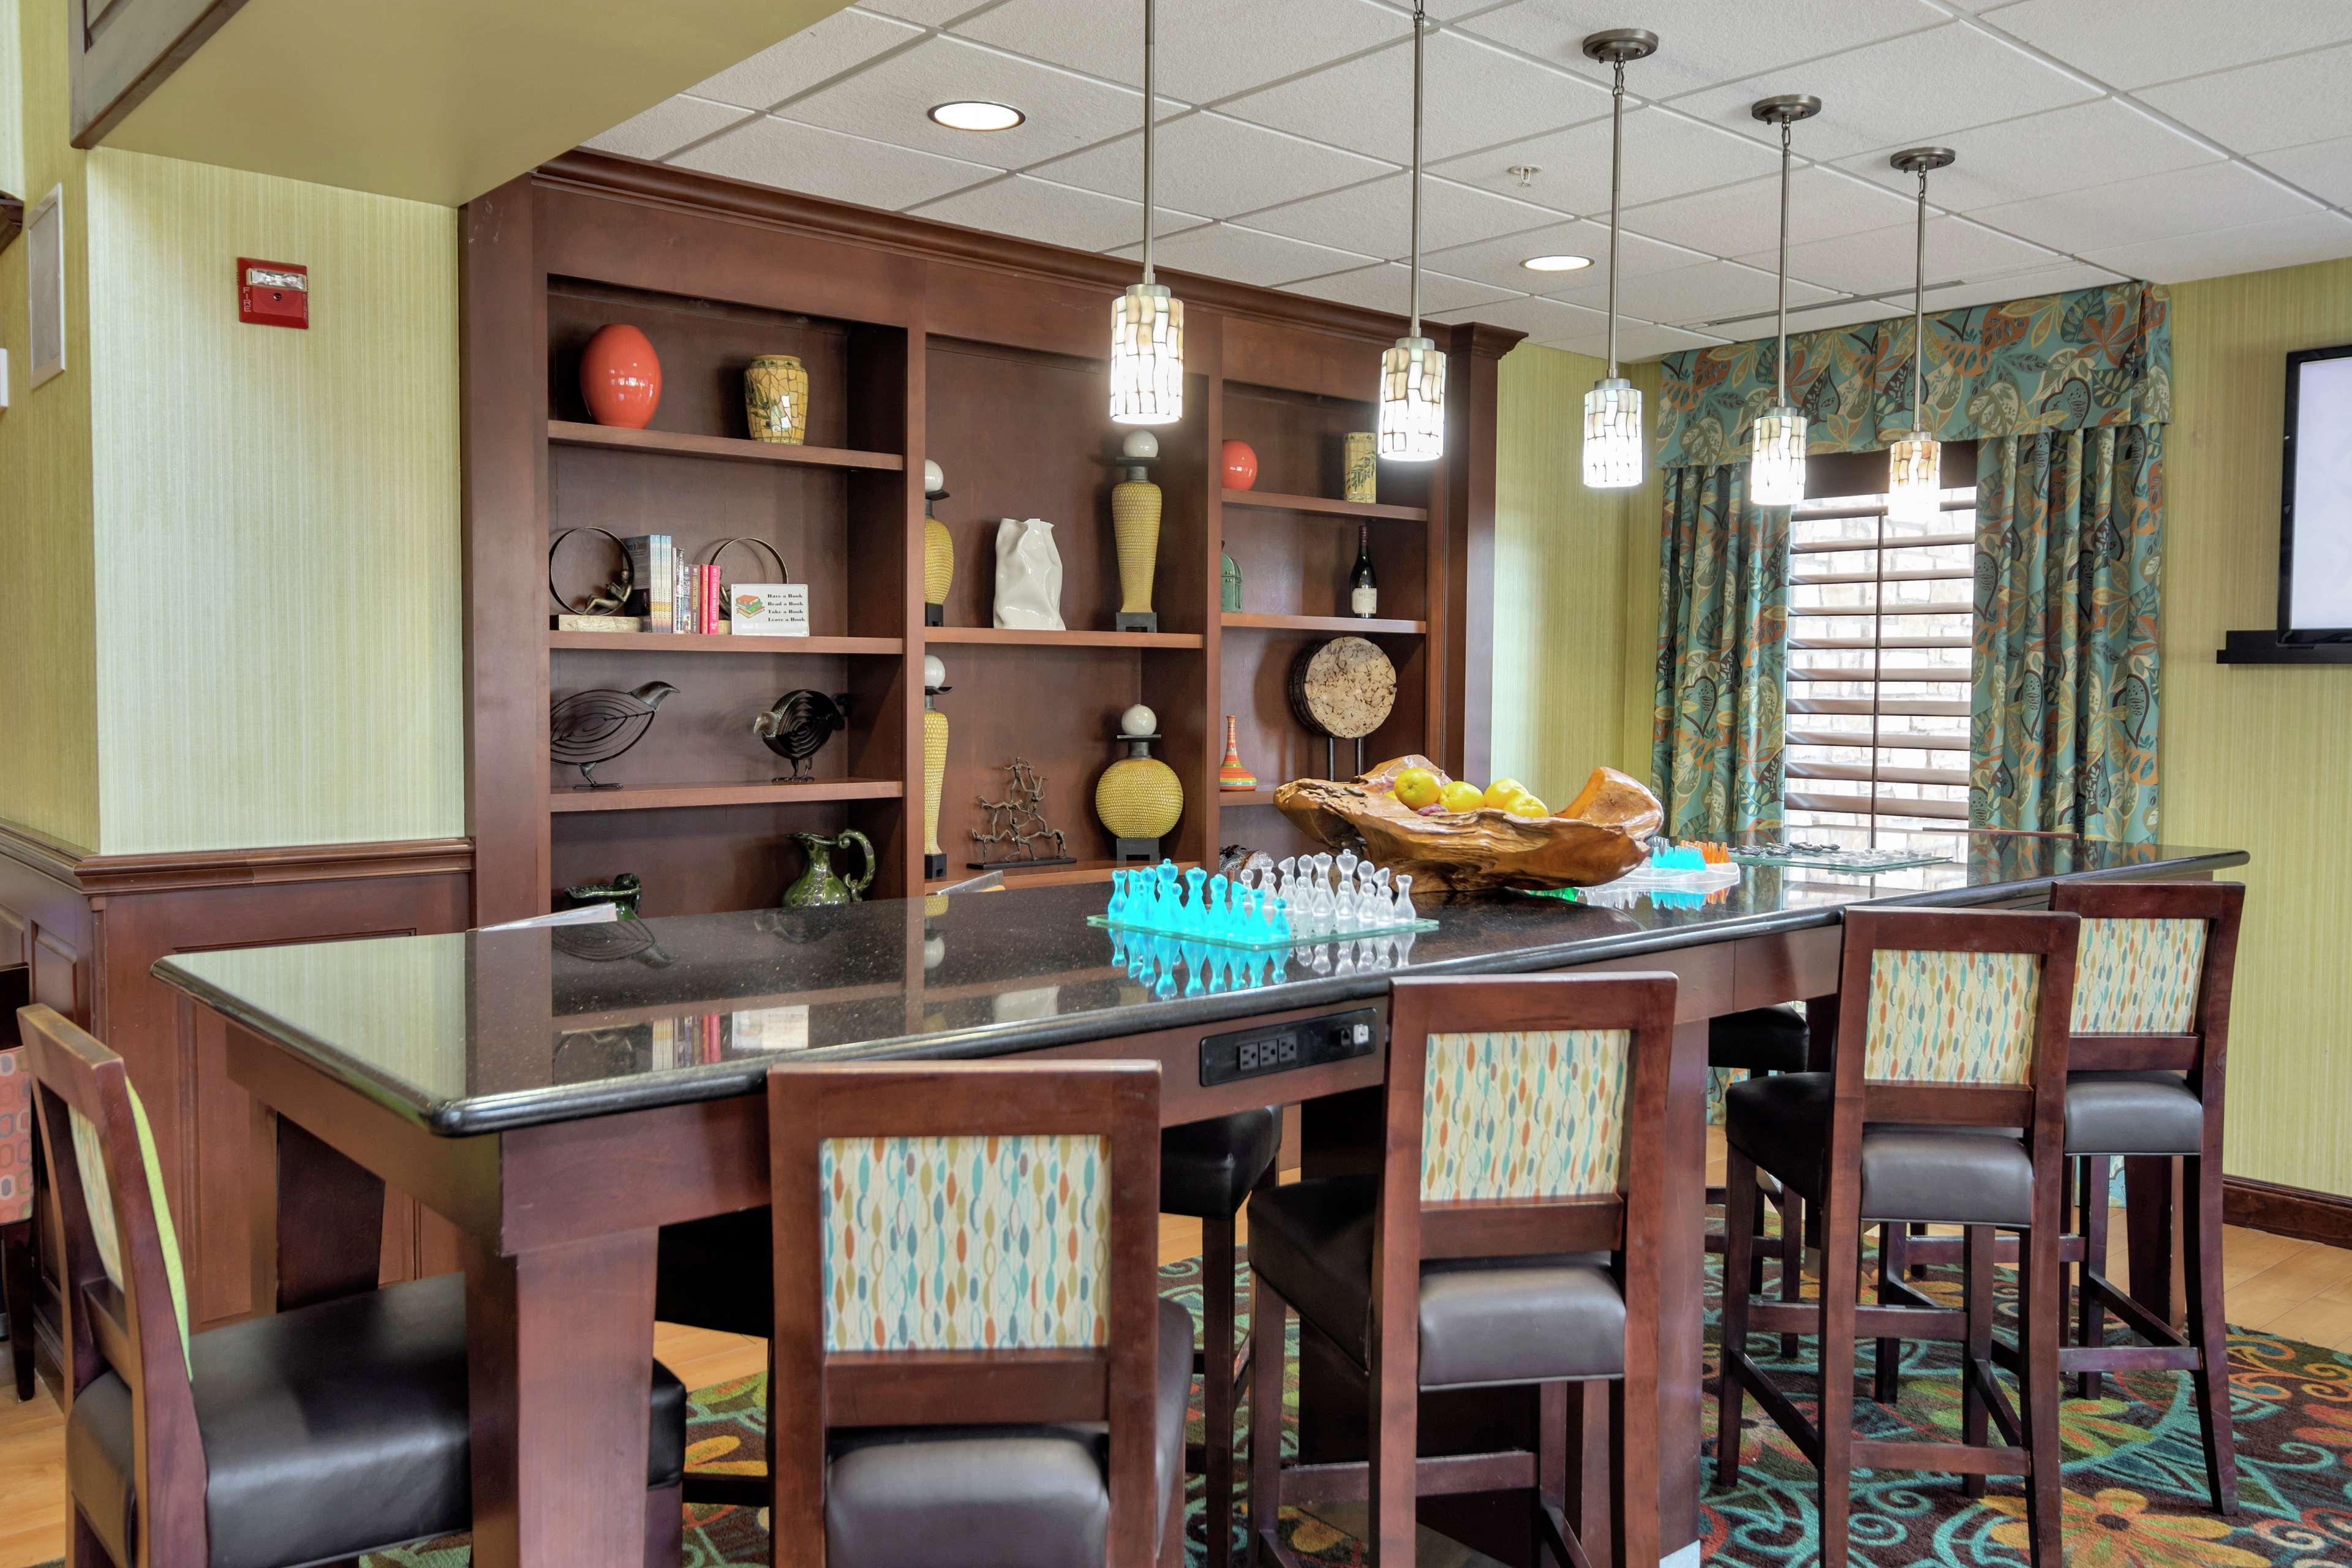 Hampton Inn & Suites Dallas-DFW ARPT W-SH 183 Hurst